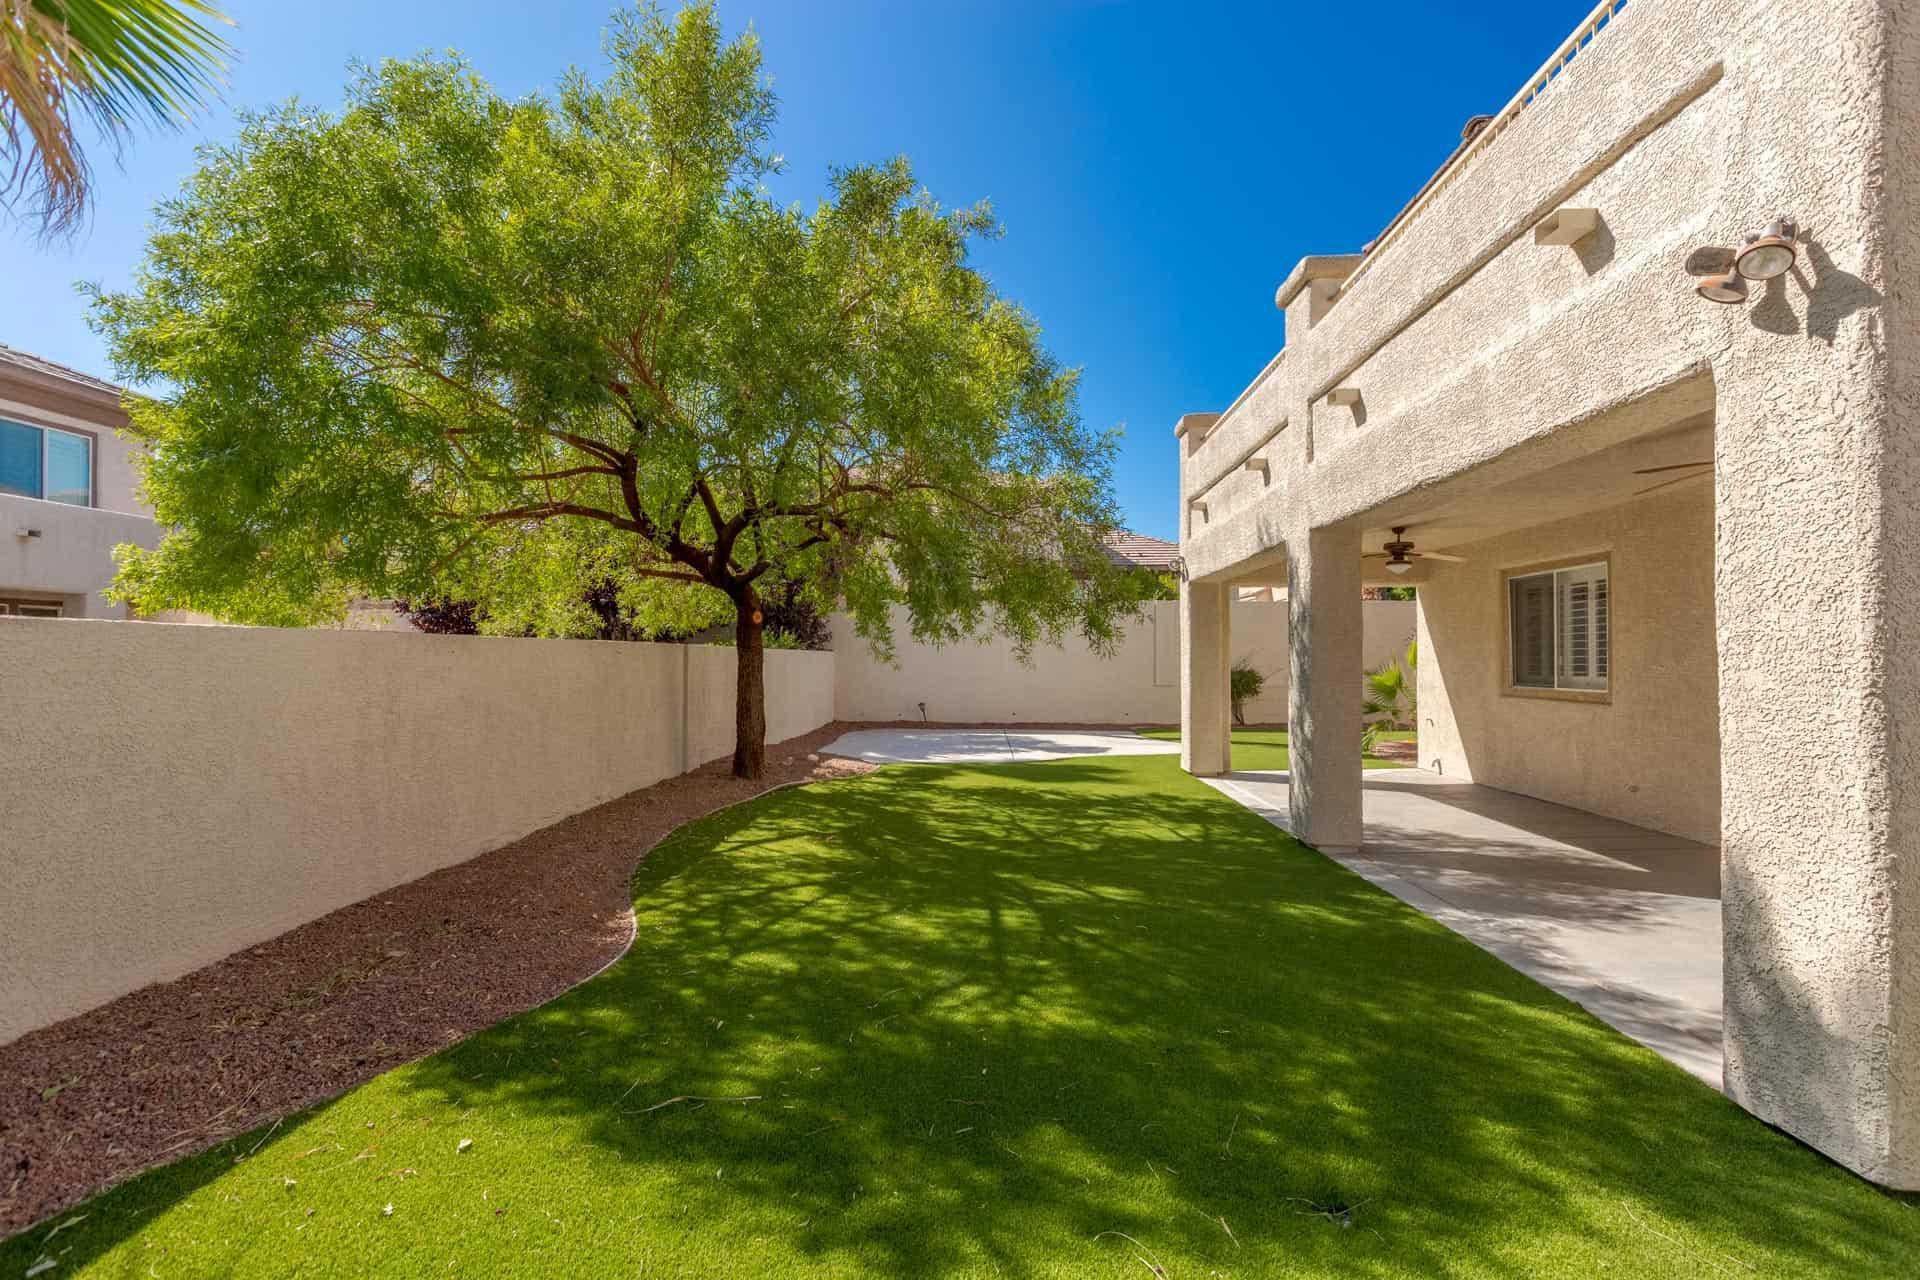 las-vegas-luxry-real-estate-realtor-rob-jensen-company-10729-grey-havens-court-willow-creek5157